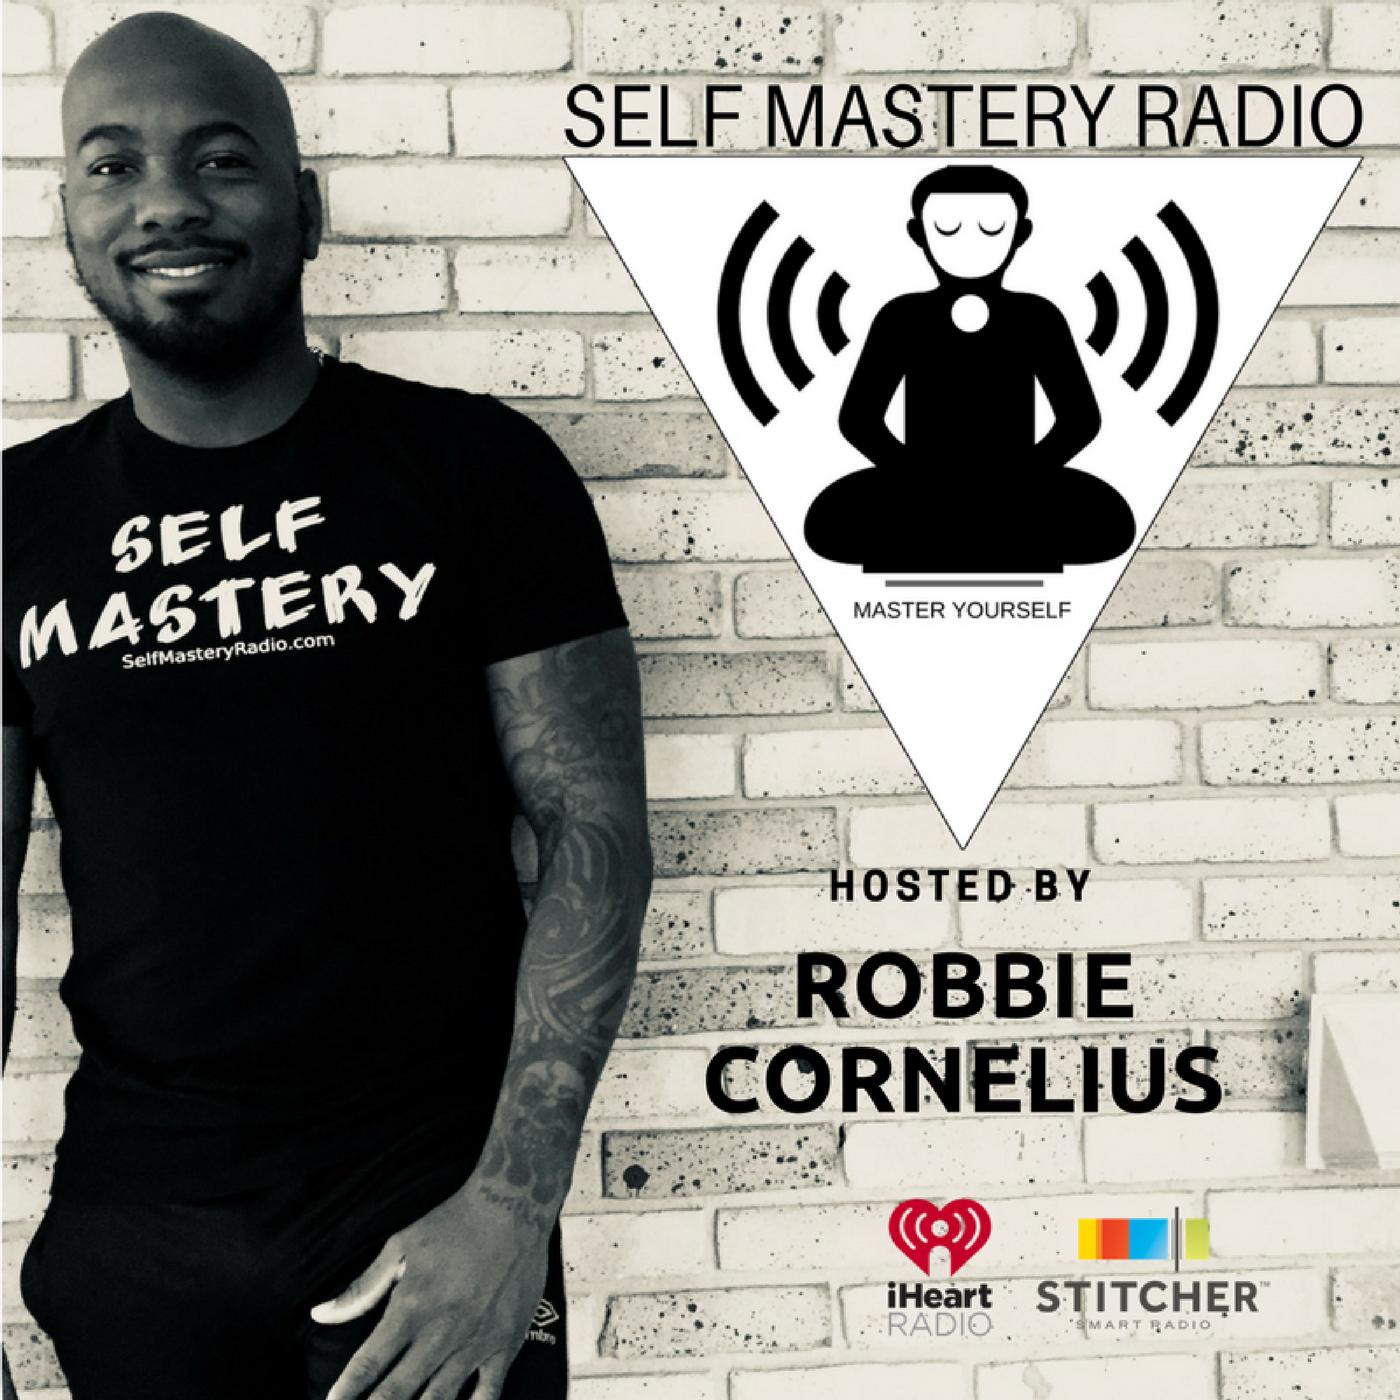 Self Mastery Radio